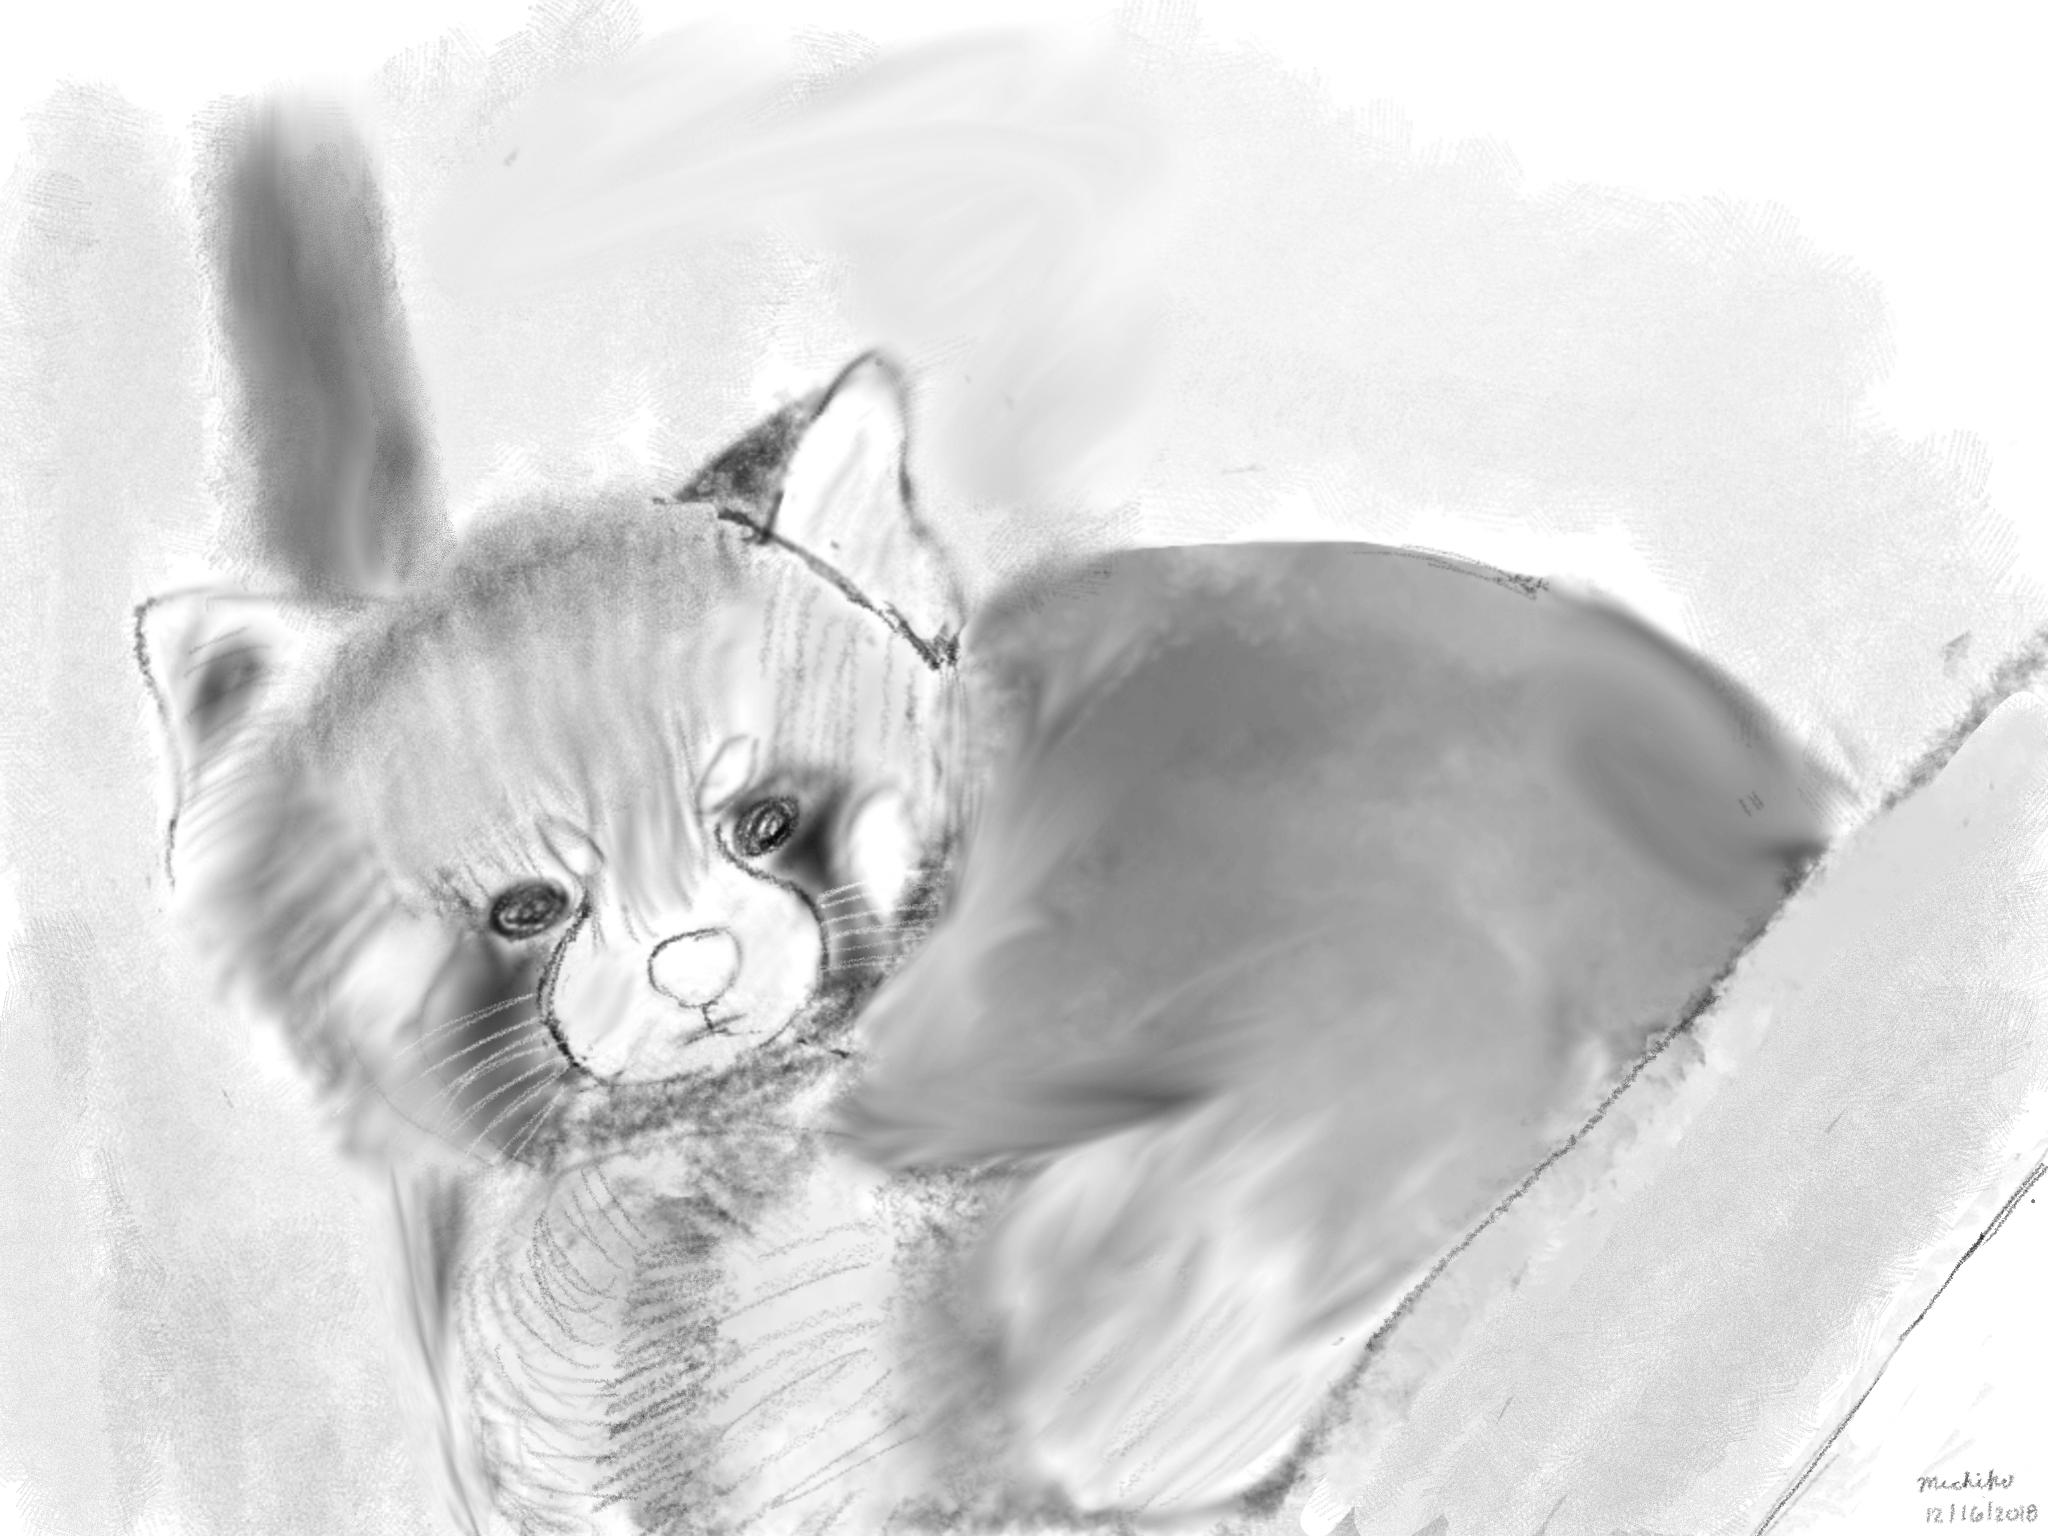 Sketch of red panda